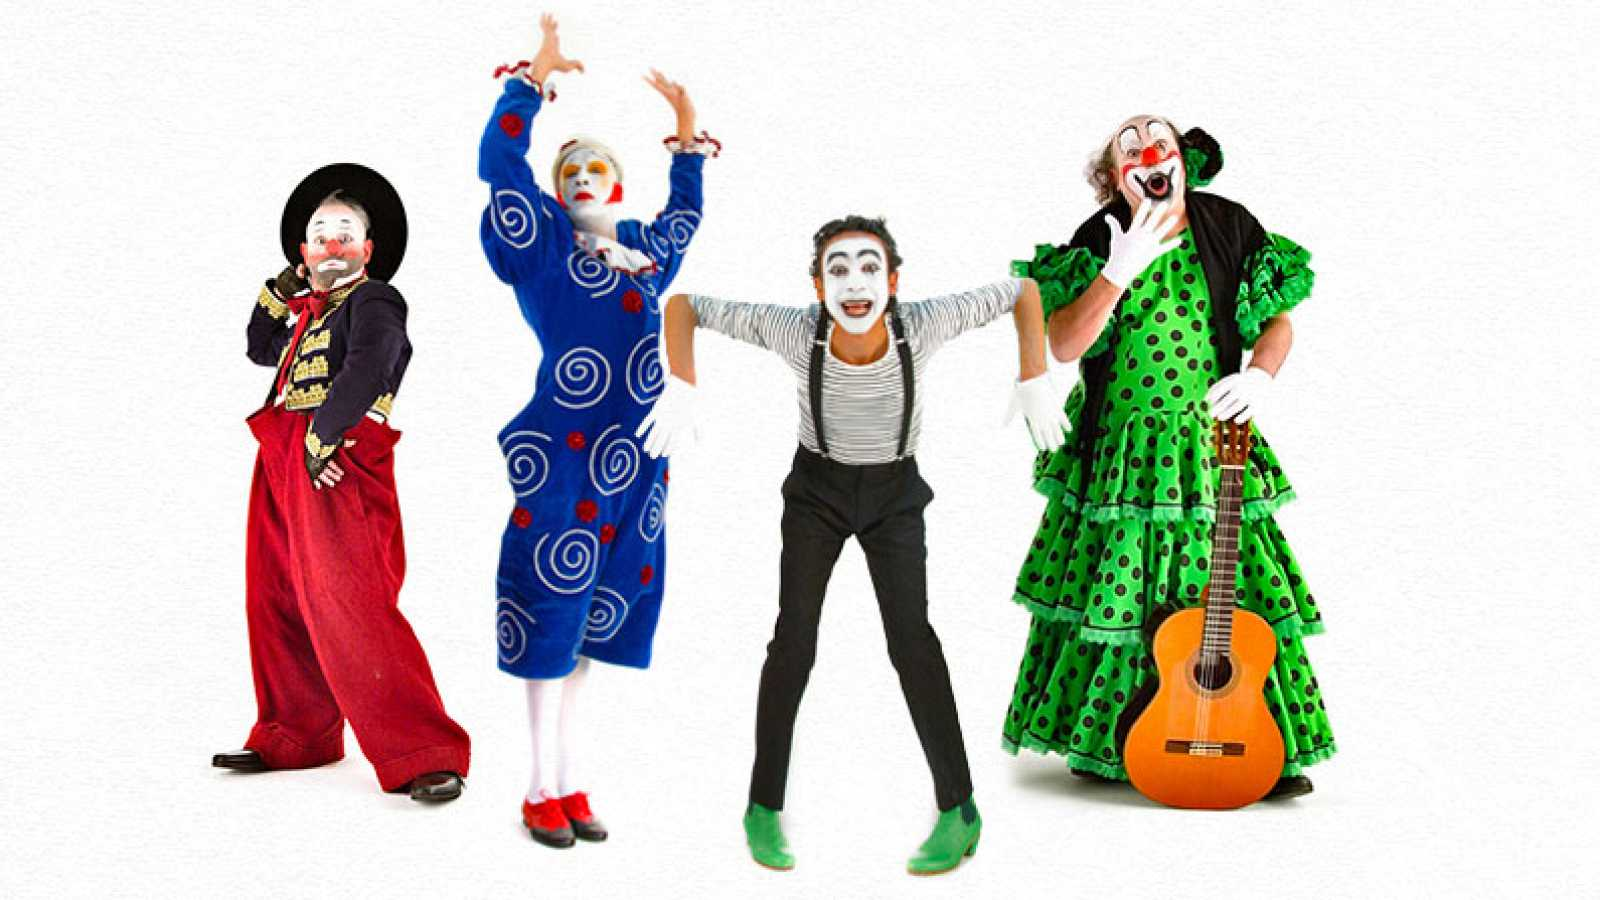 Gitanos - 'Chufla' no es flamenco, no es circo... o sí - 22/09/19 - escuchar ahora